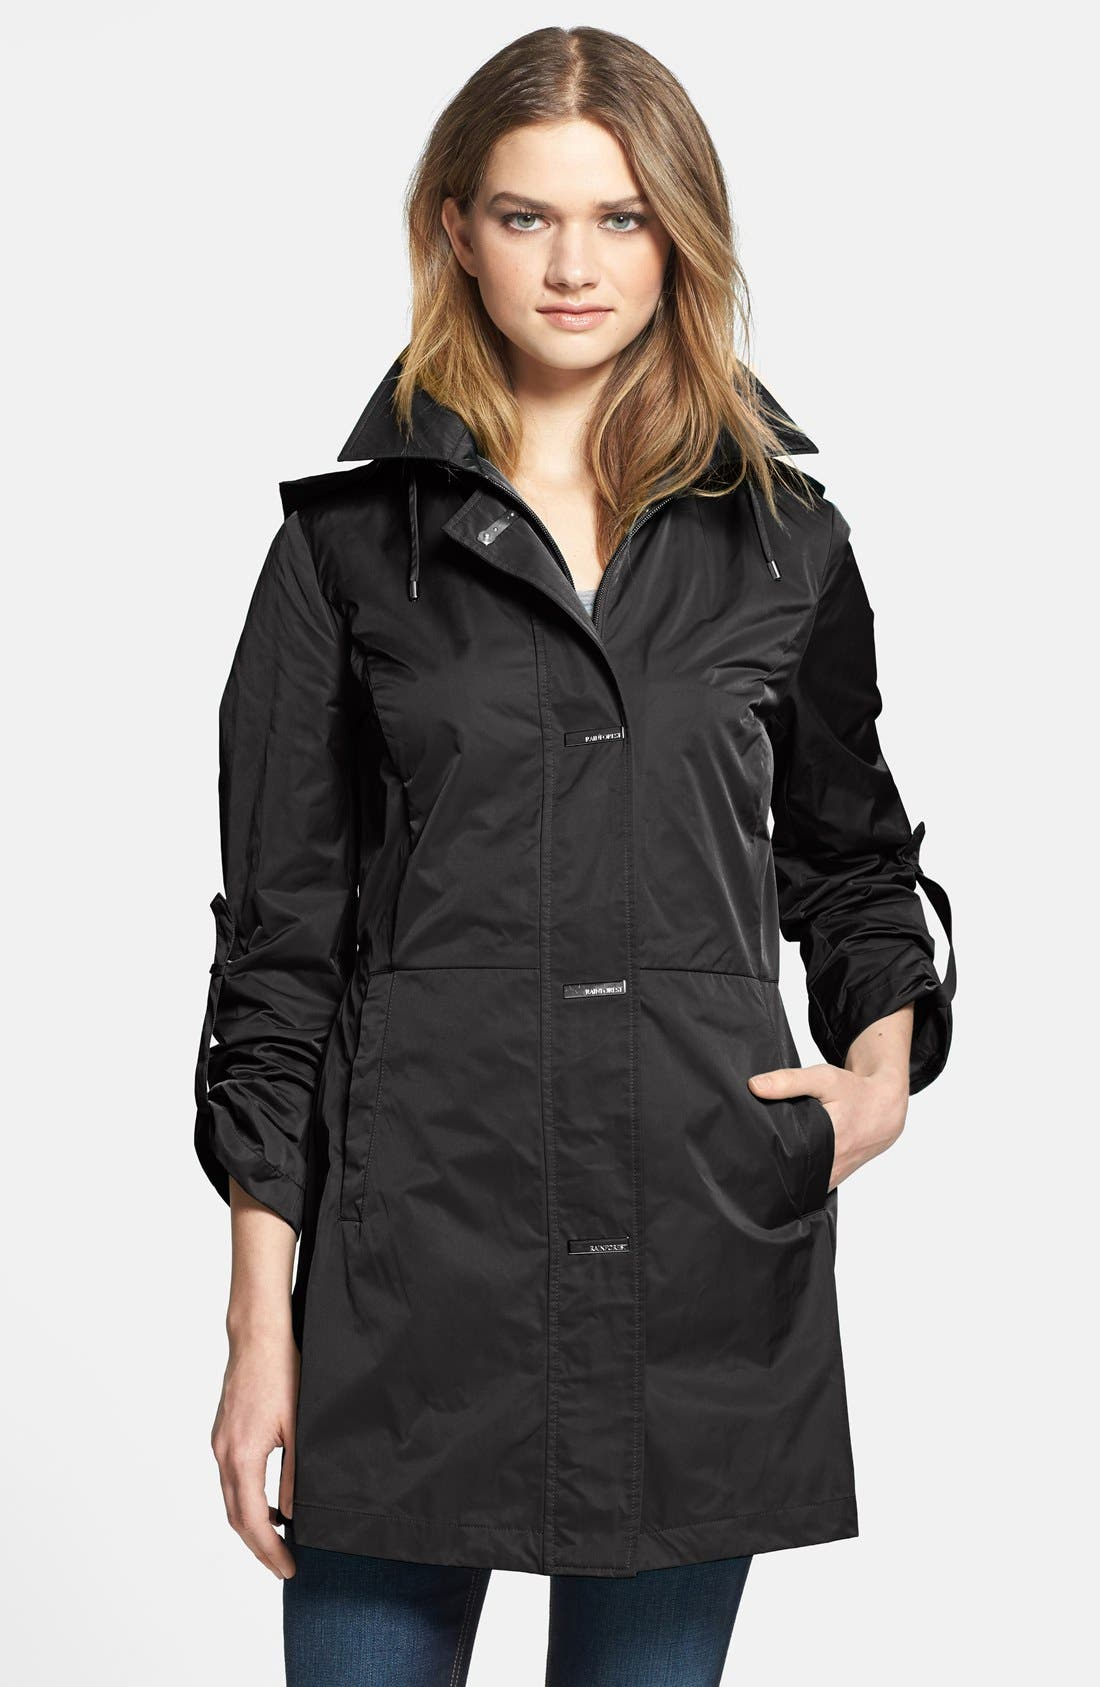 Alternate Image 1 Selected - RAINFOREST Packable Roll Sleeve Jacket